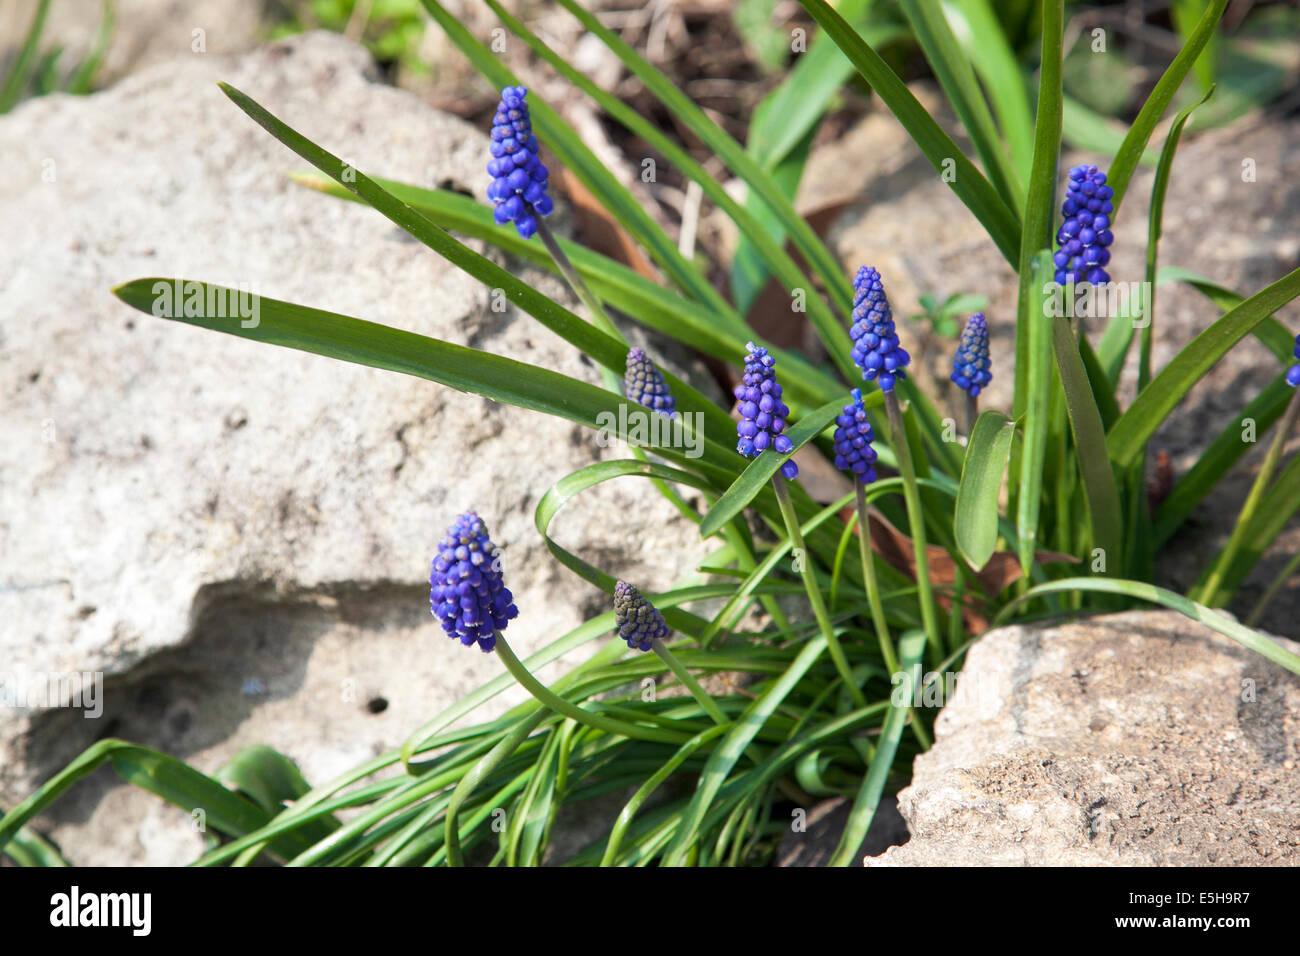 Muscari (grape hyacinths) flowers growing between rocks Stock Photo